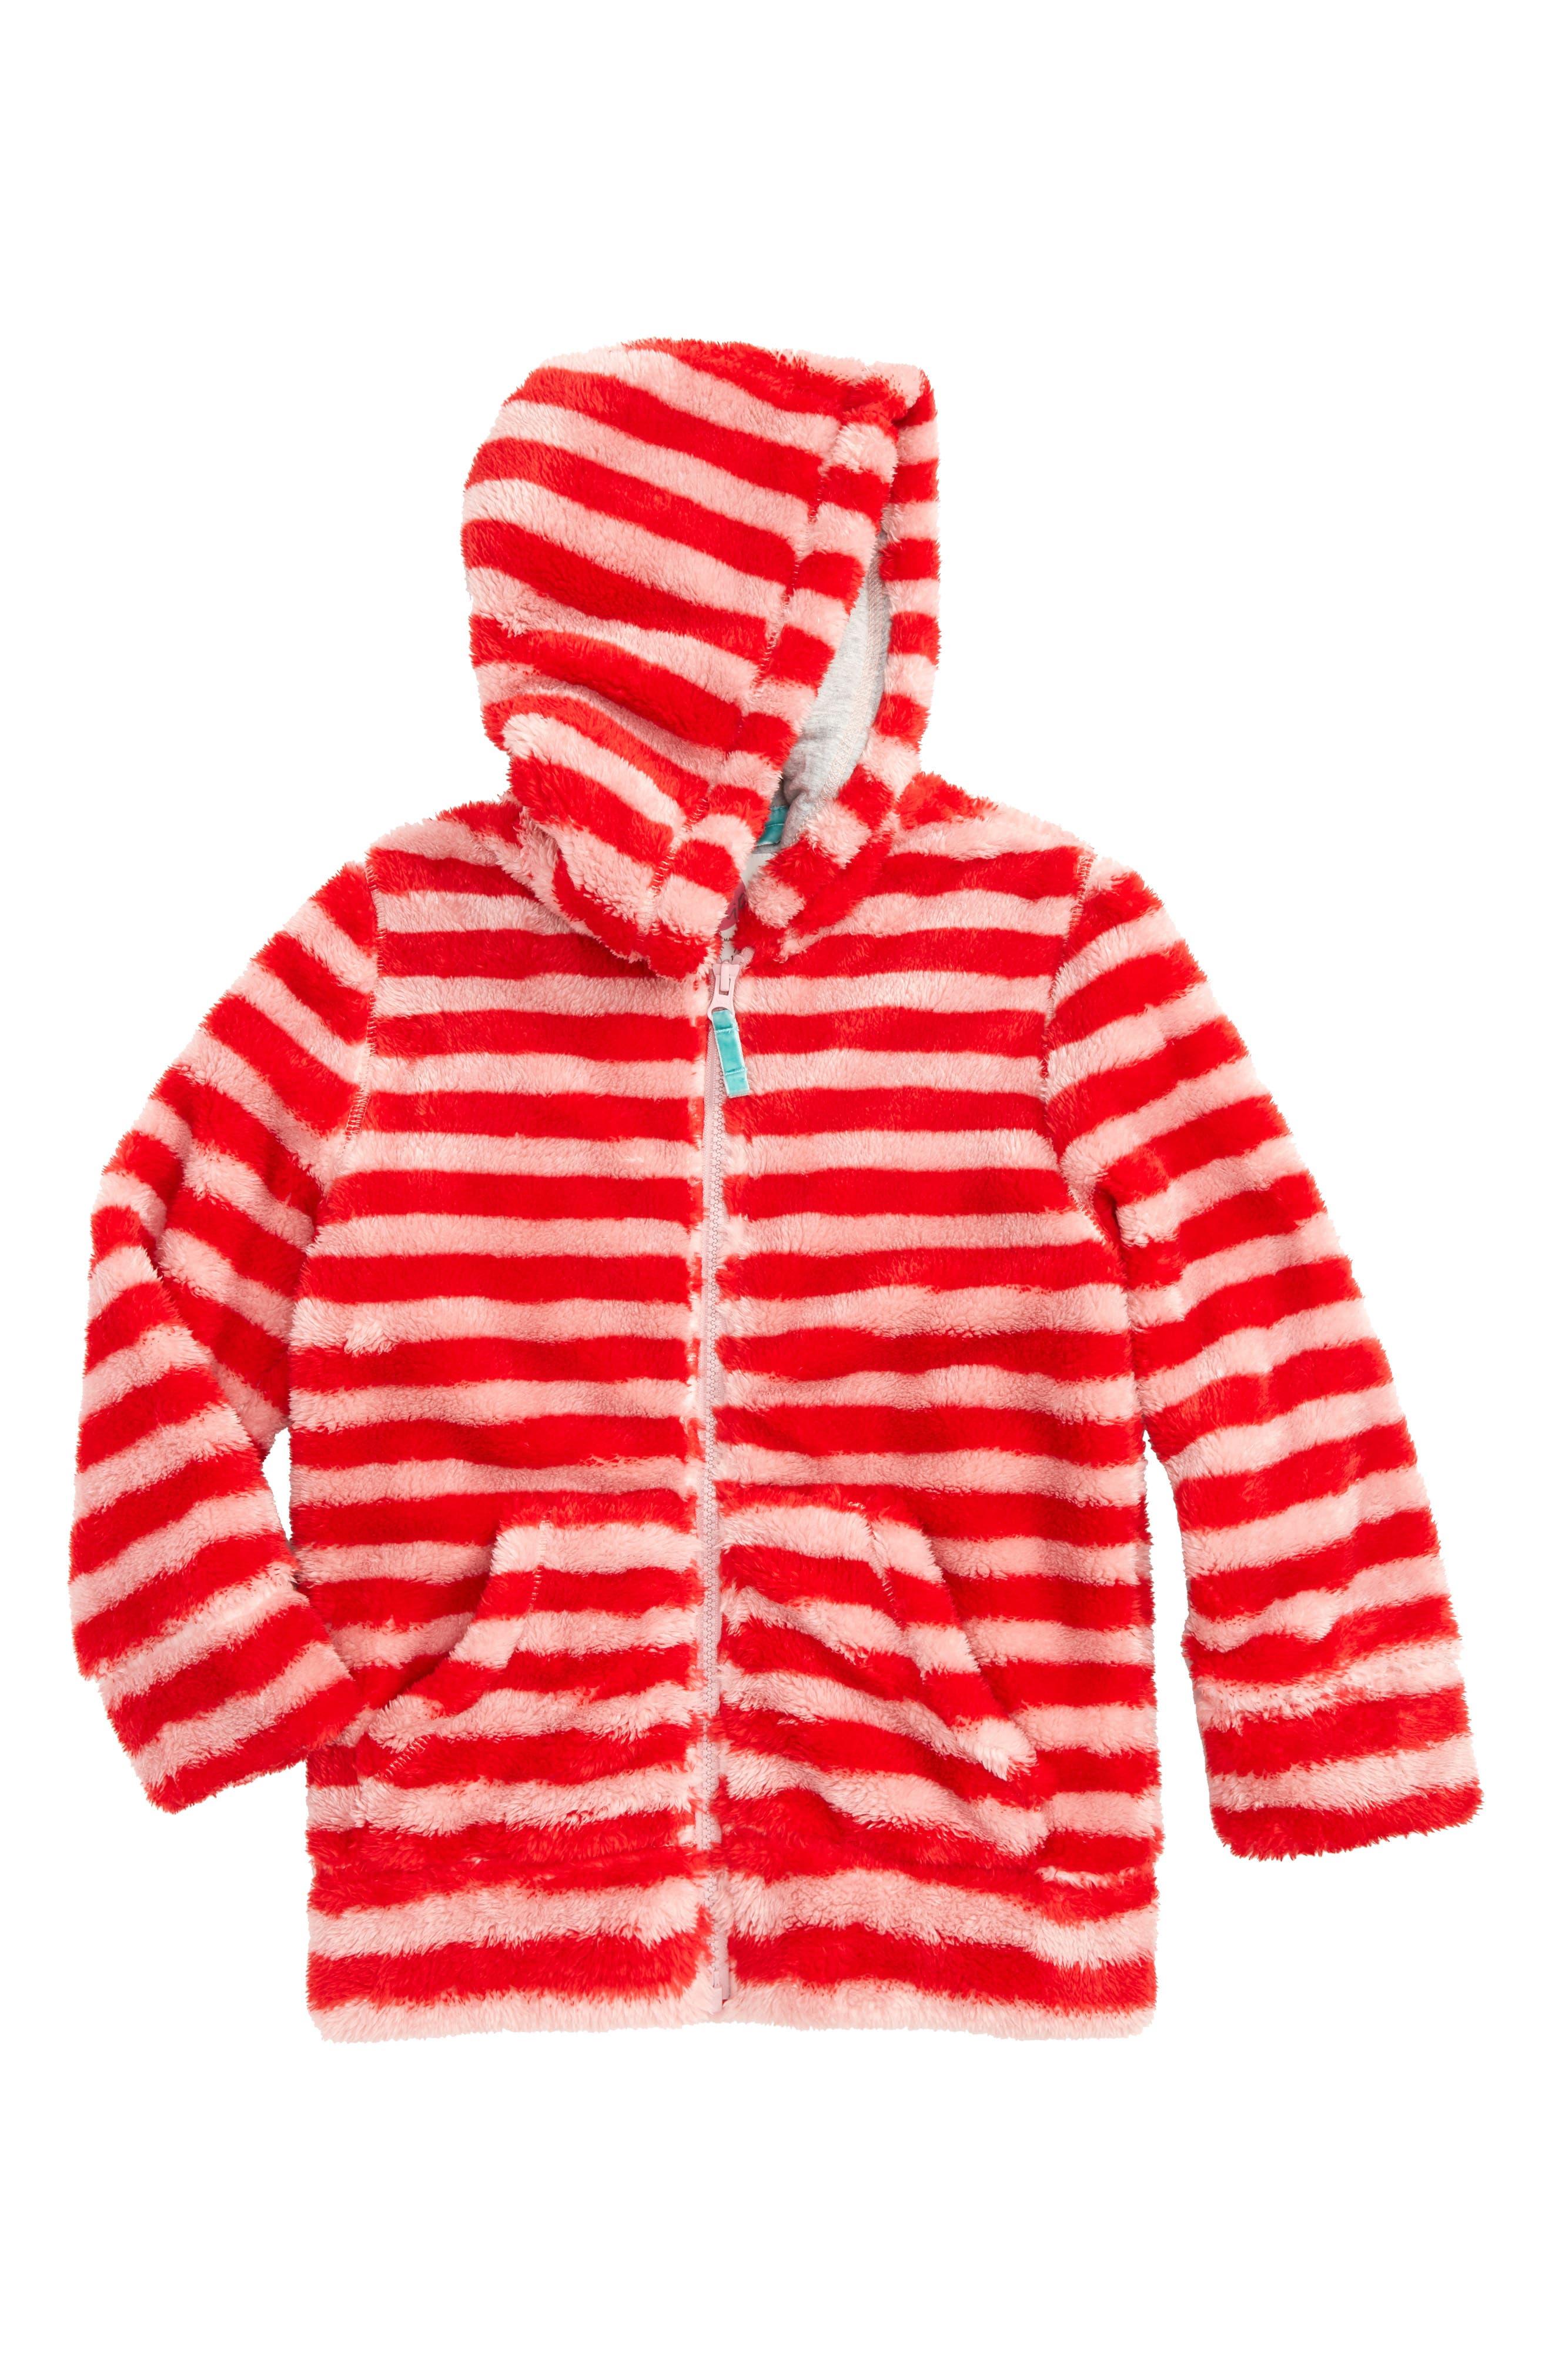 Alternate Image 1 Selected - Mini Boden Teddy Zip-Up Hoodie (Toddler Girls, Little Girls & Big Girls)